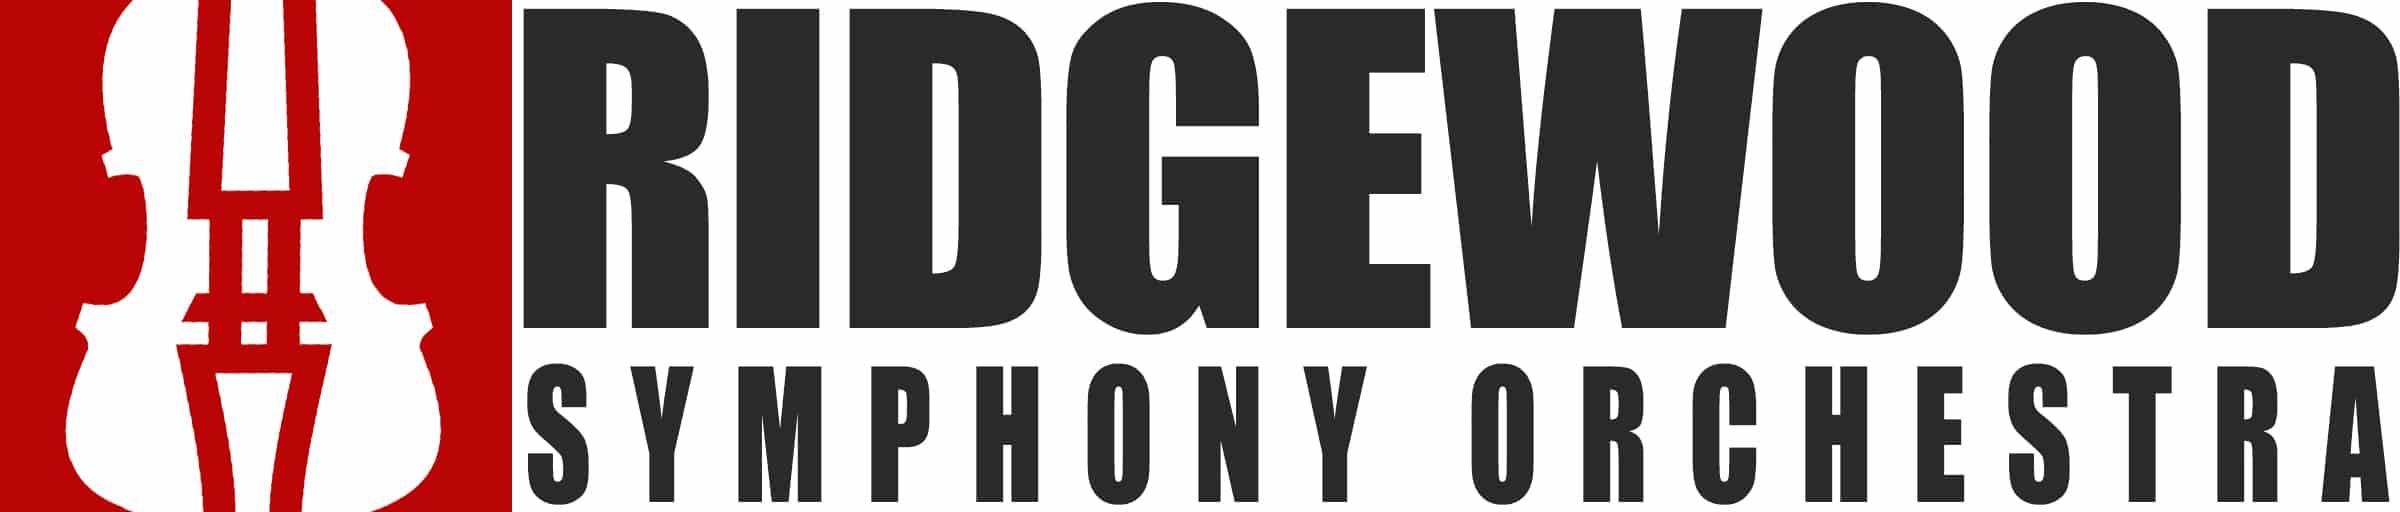 Ridgewood Symphony Orchestra